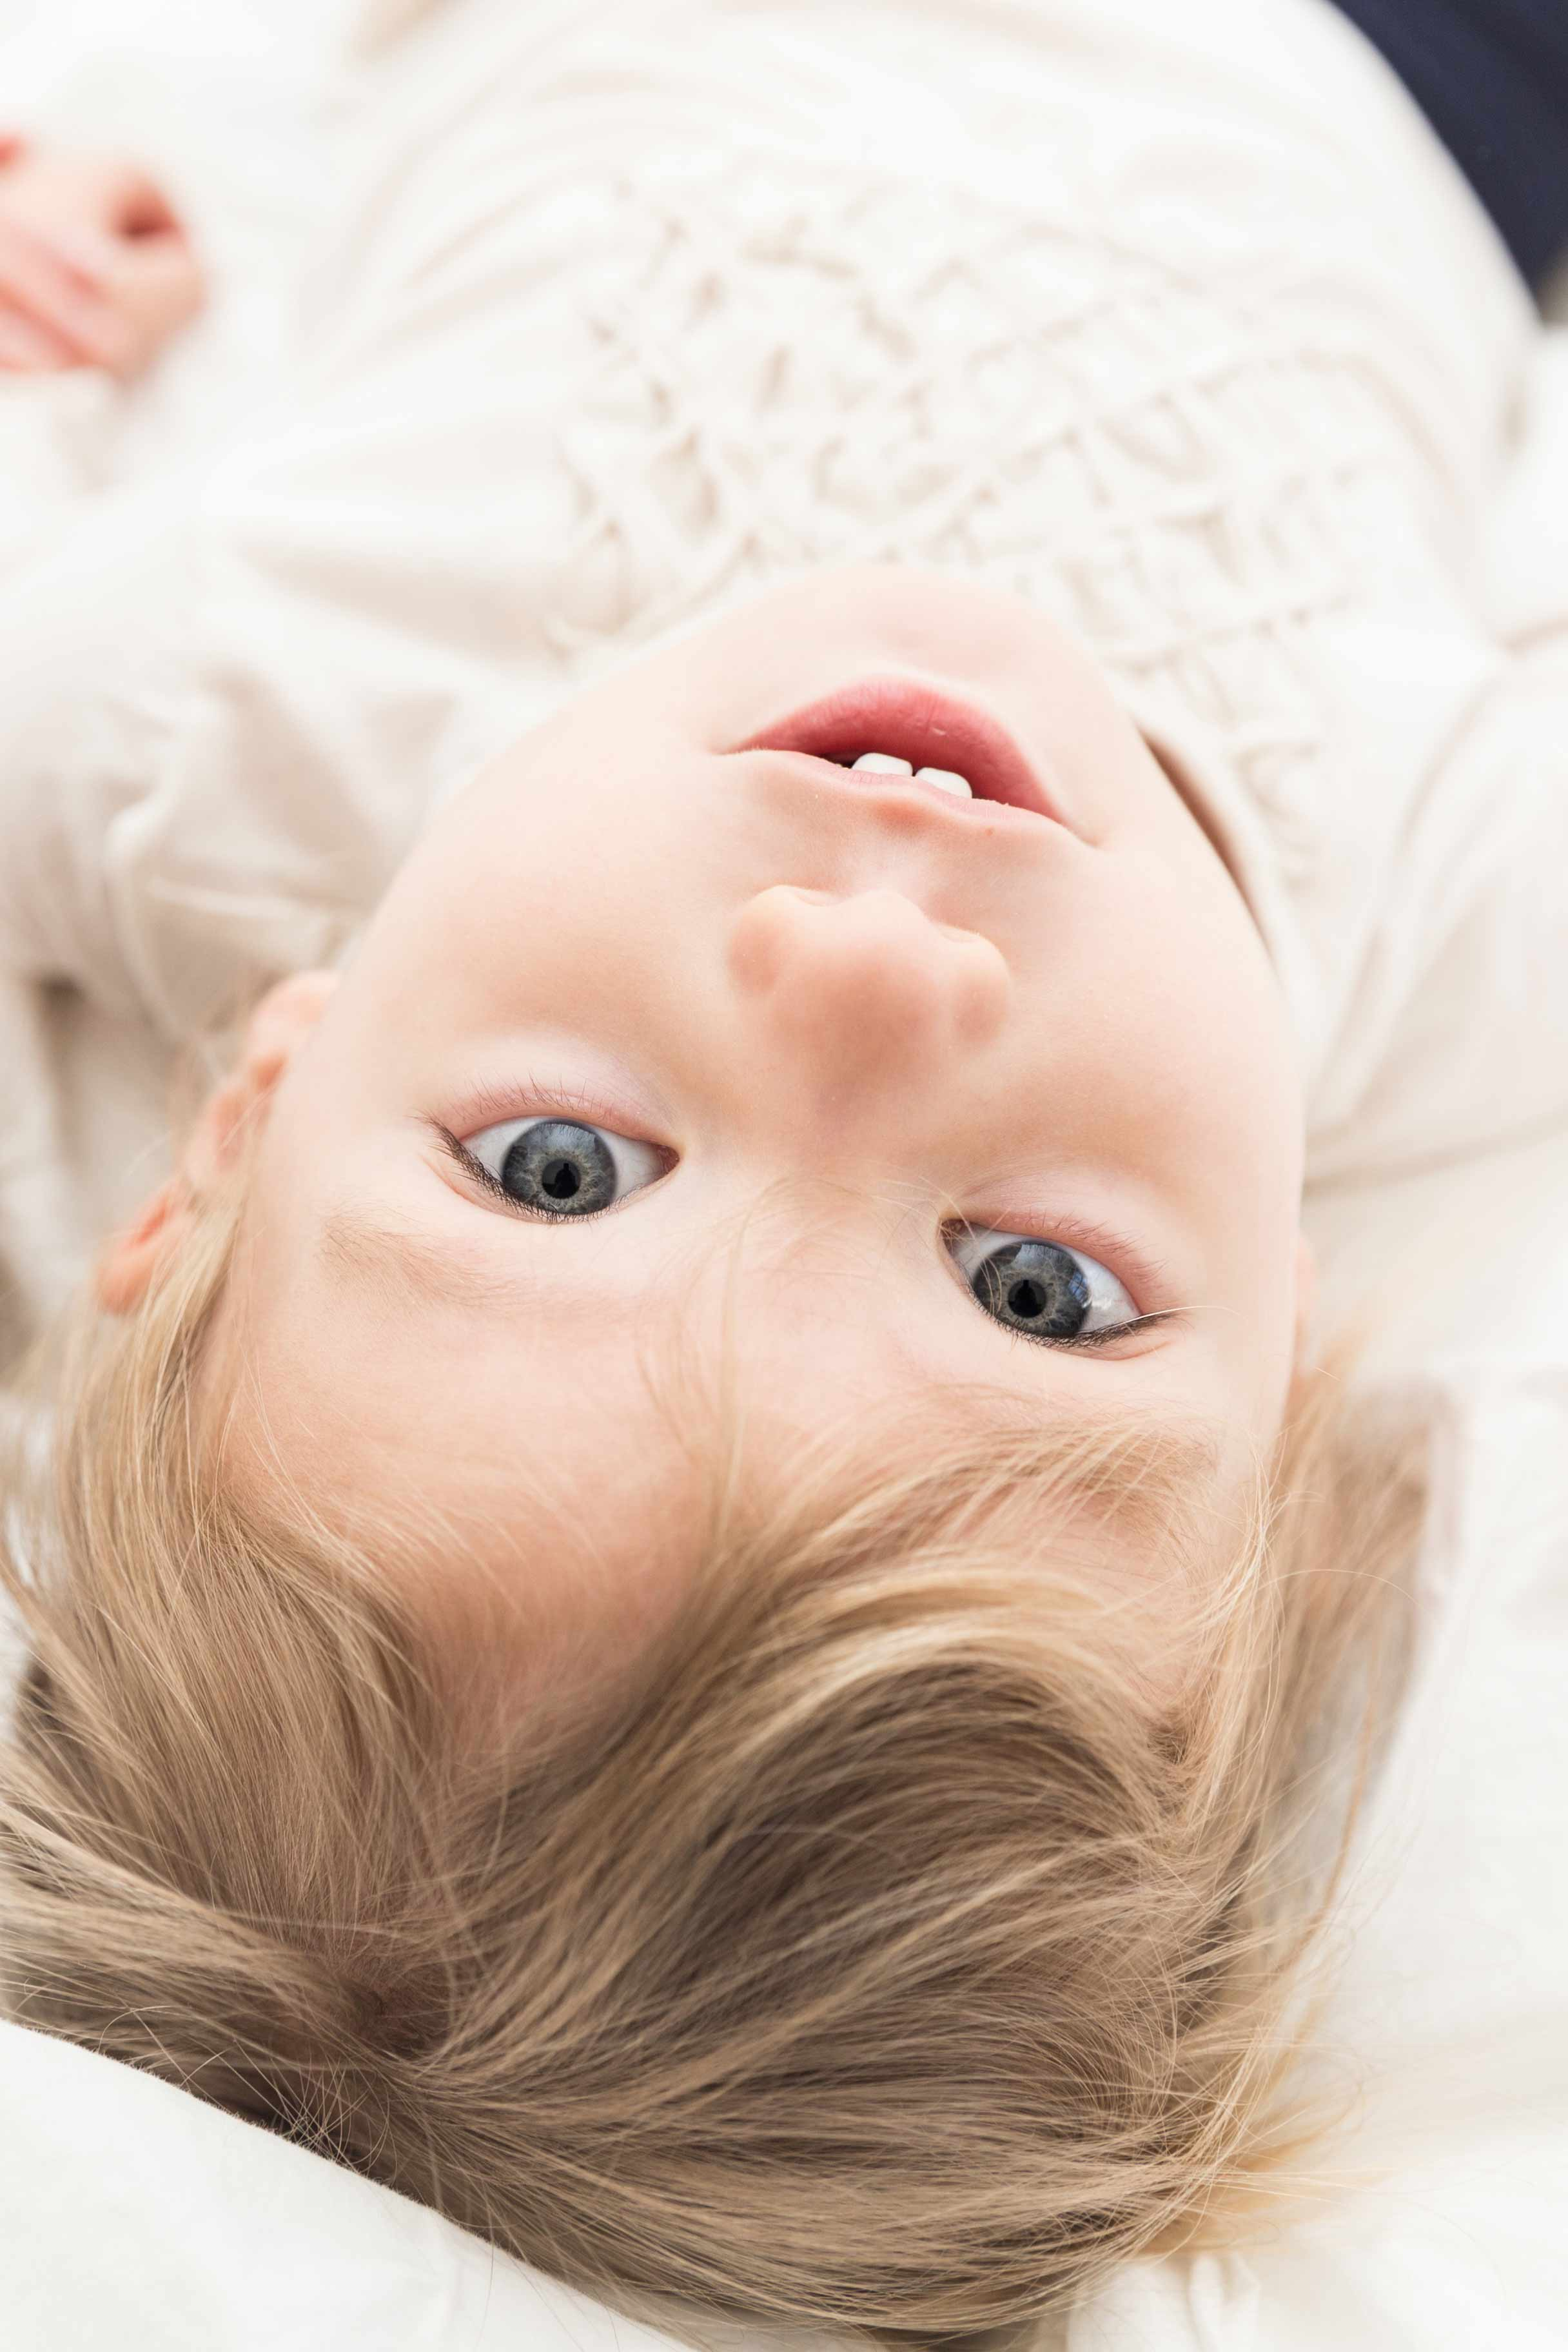 newborn photographer bergen county nj lifestyle family photographer